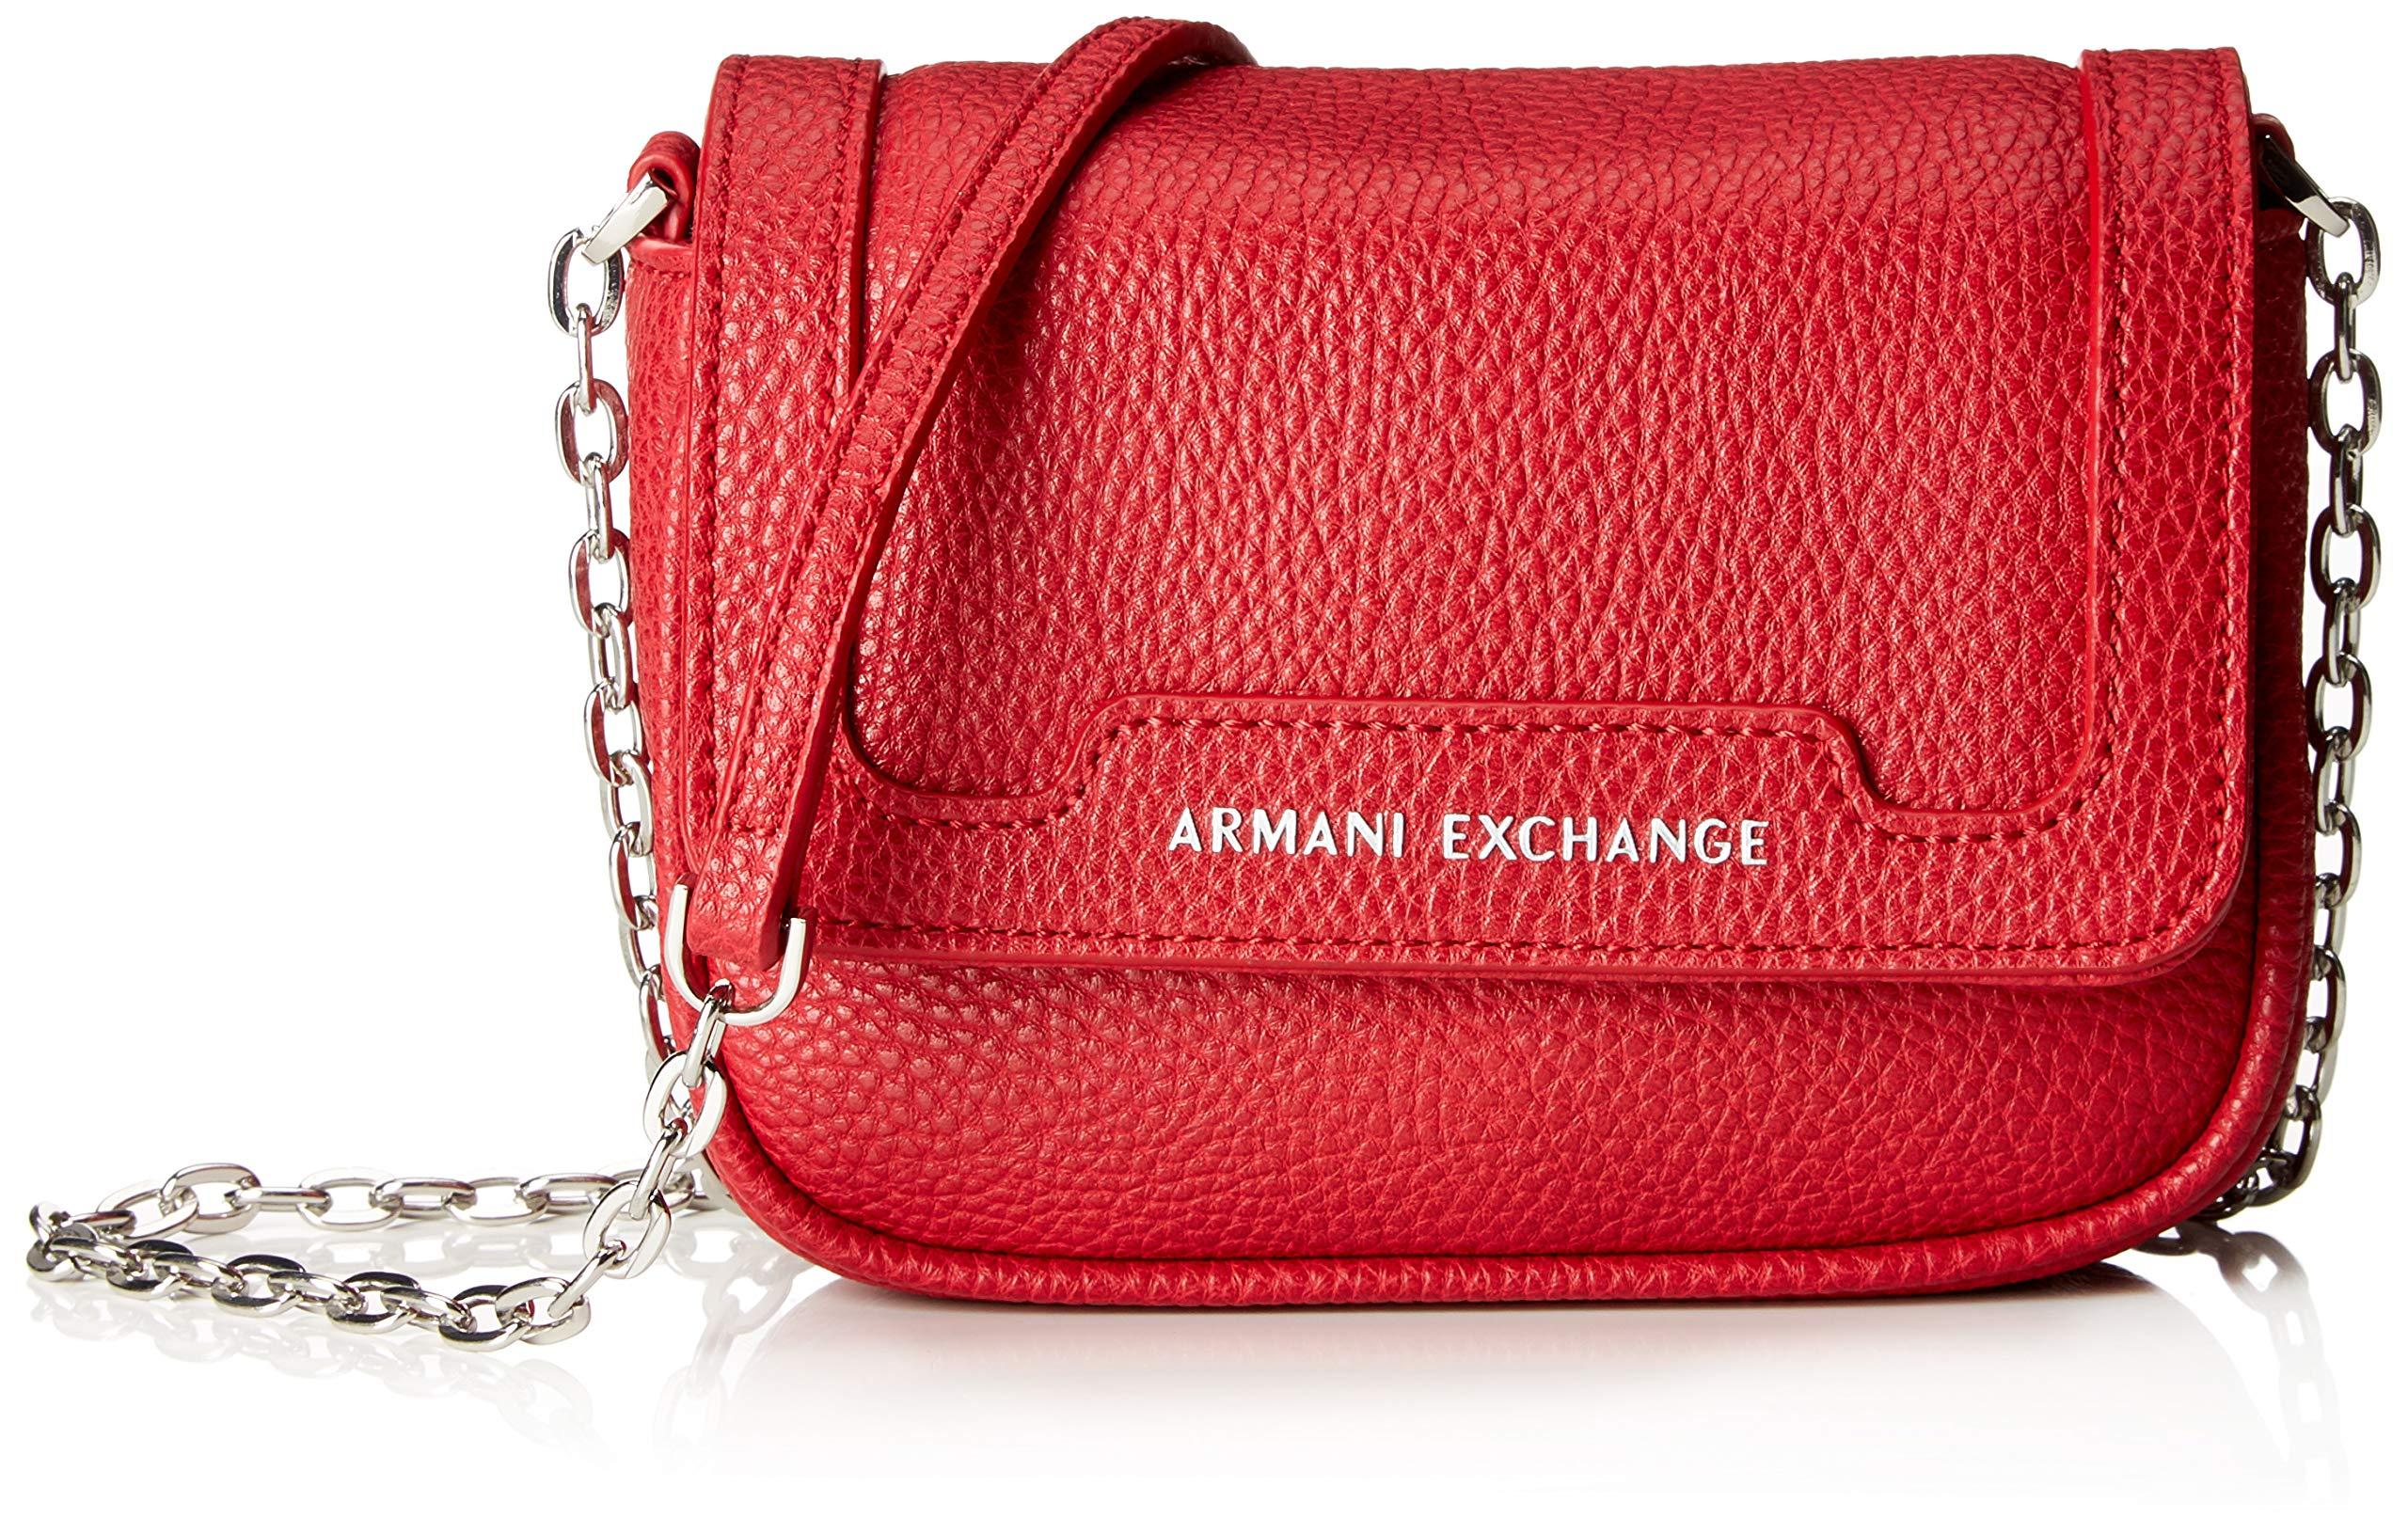 Crossbody Red12x5x16 Exchange X BagSacs FemmeRougeroyal Armani Bandoulière T Small H Cmb 5jq3R4cAL